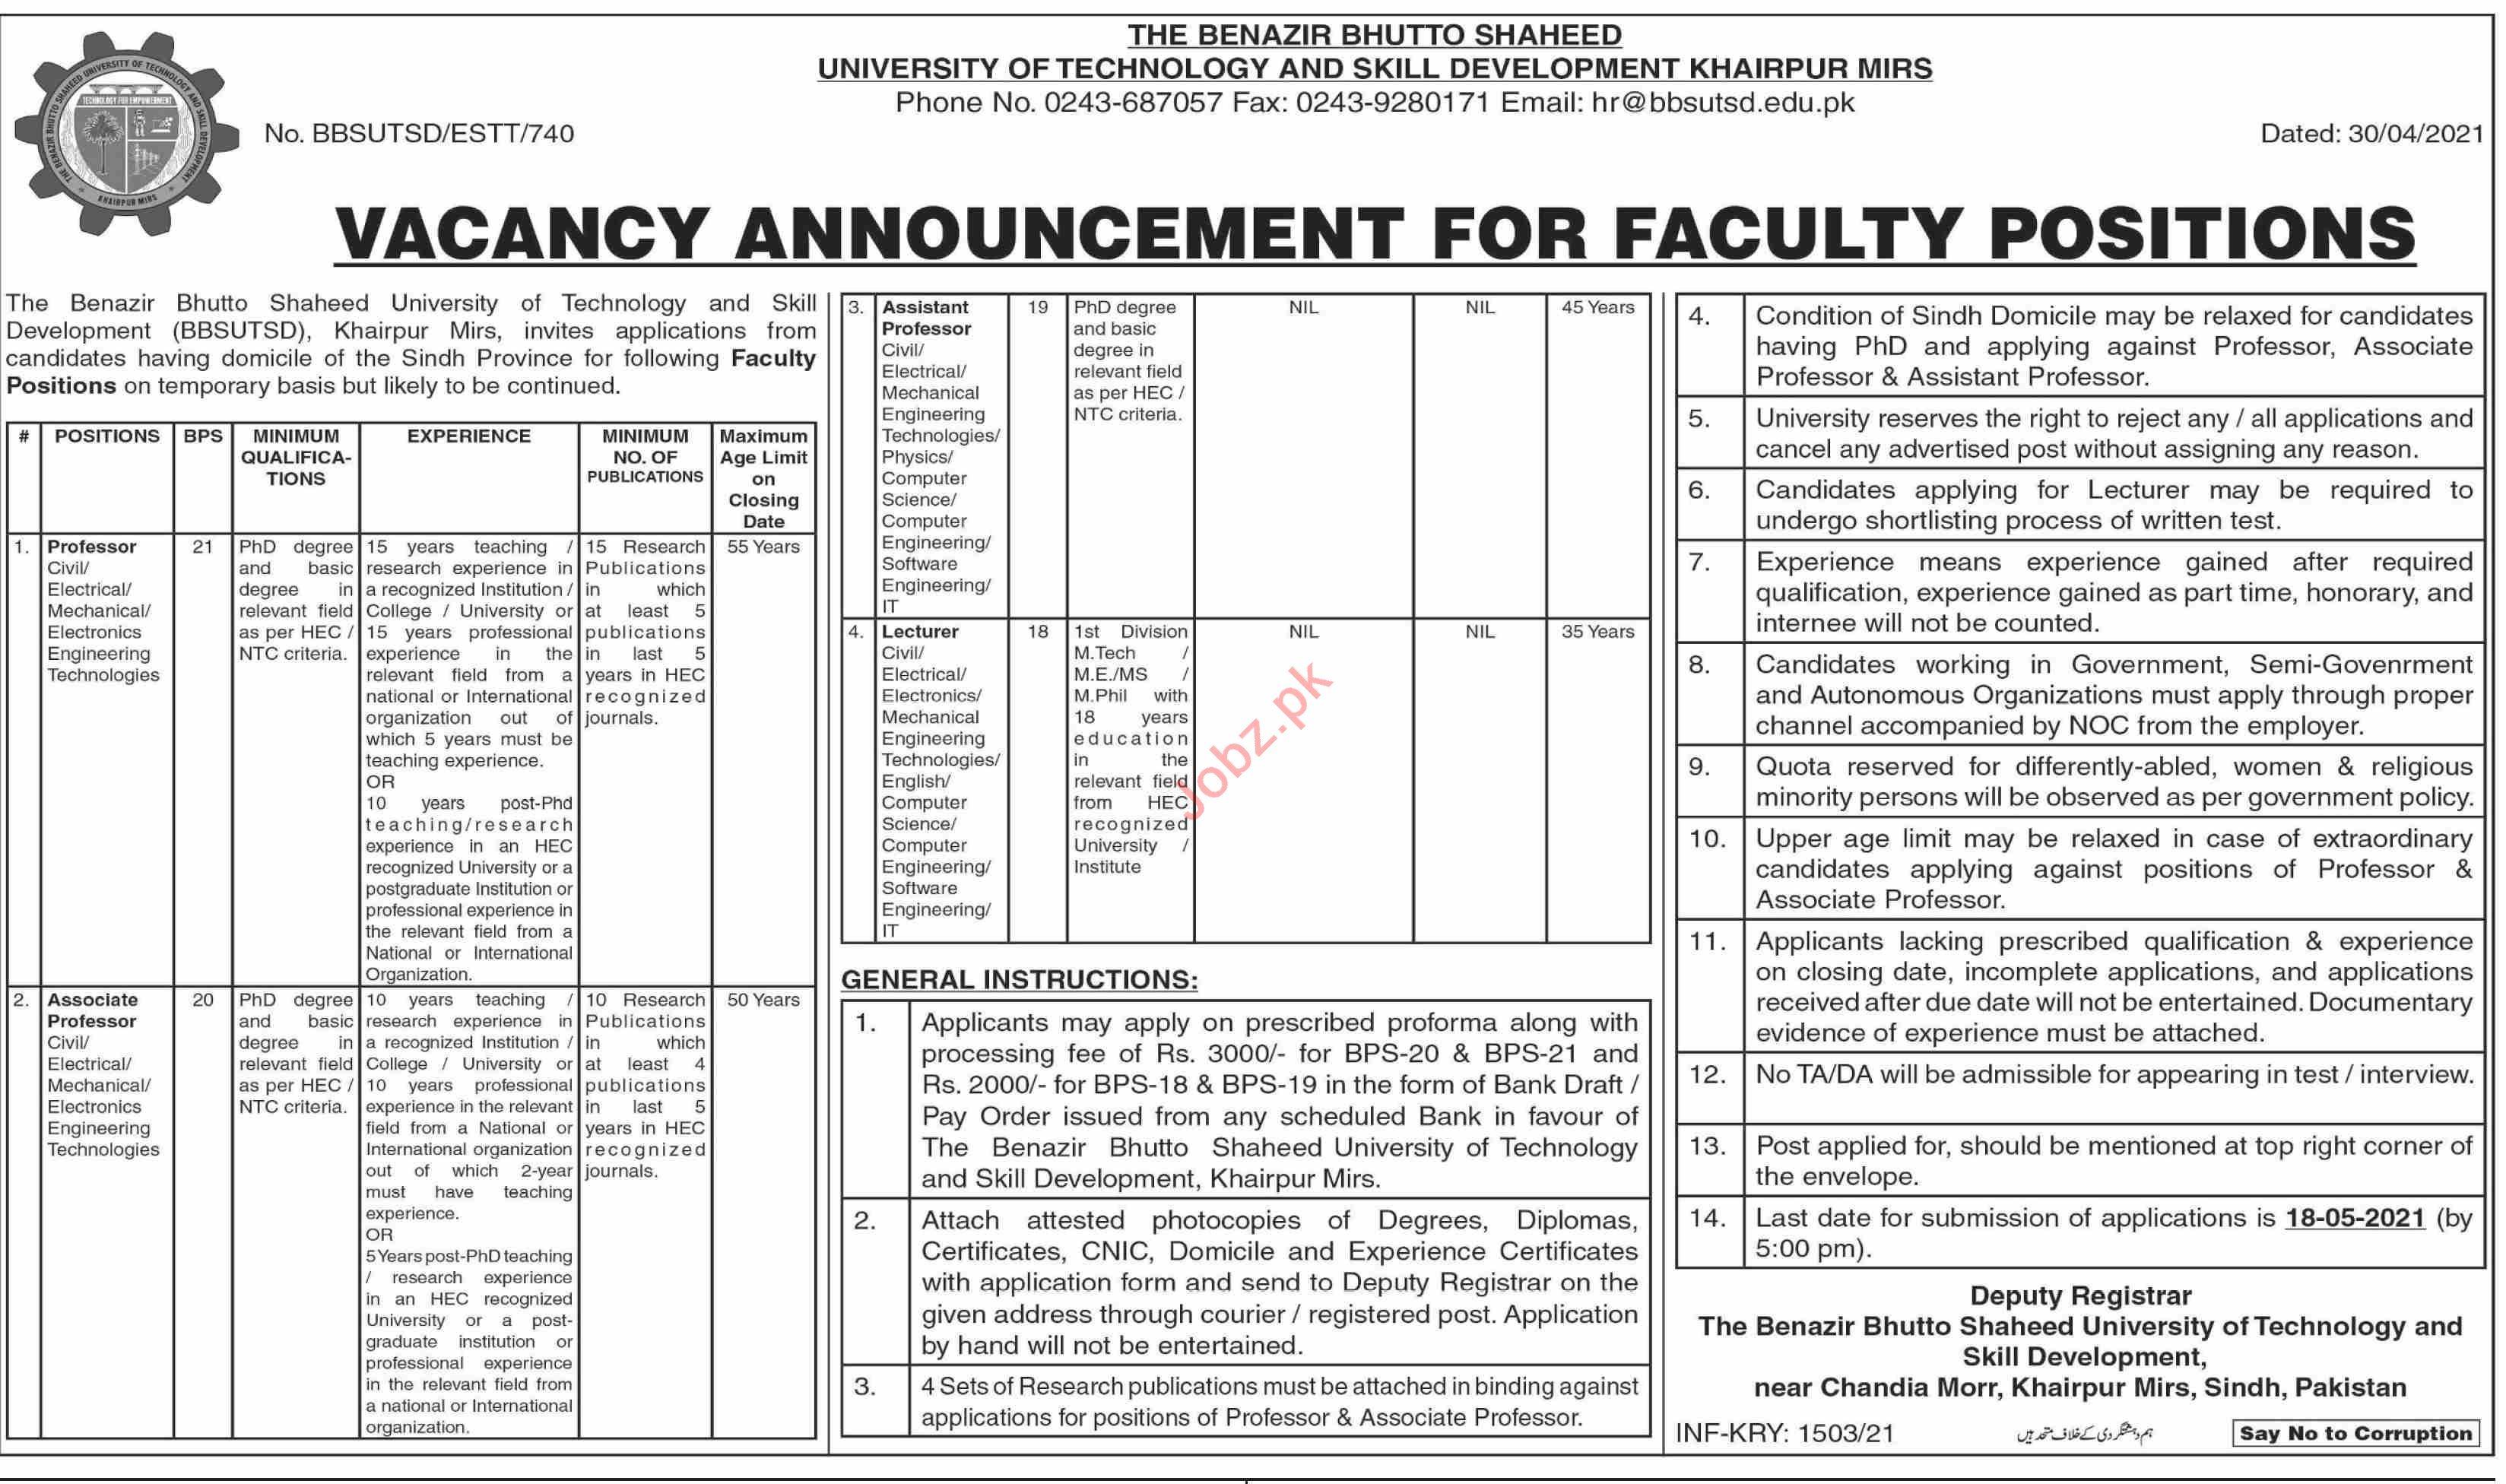 Benazir Bhutto Shaheed University of Technology BBSUTSD Jobs